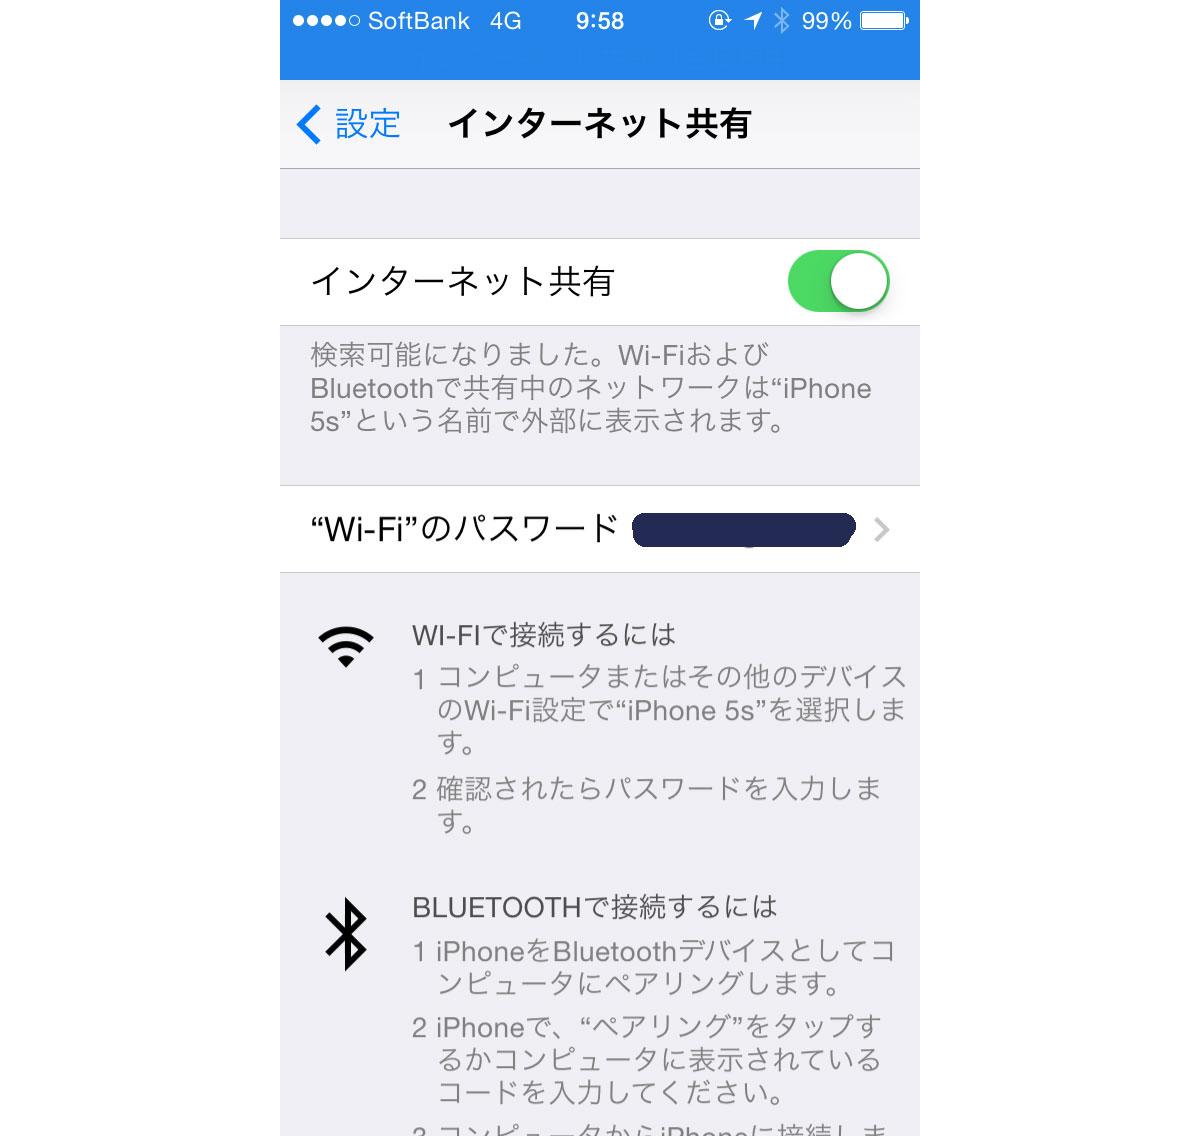 iPhone テザリング wifi